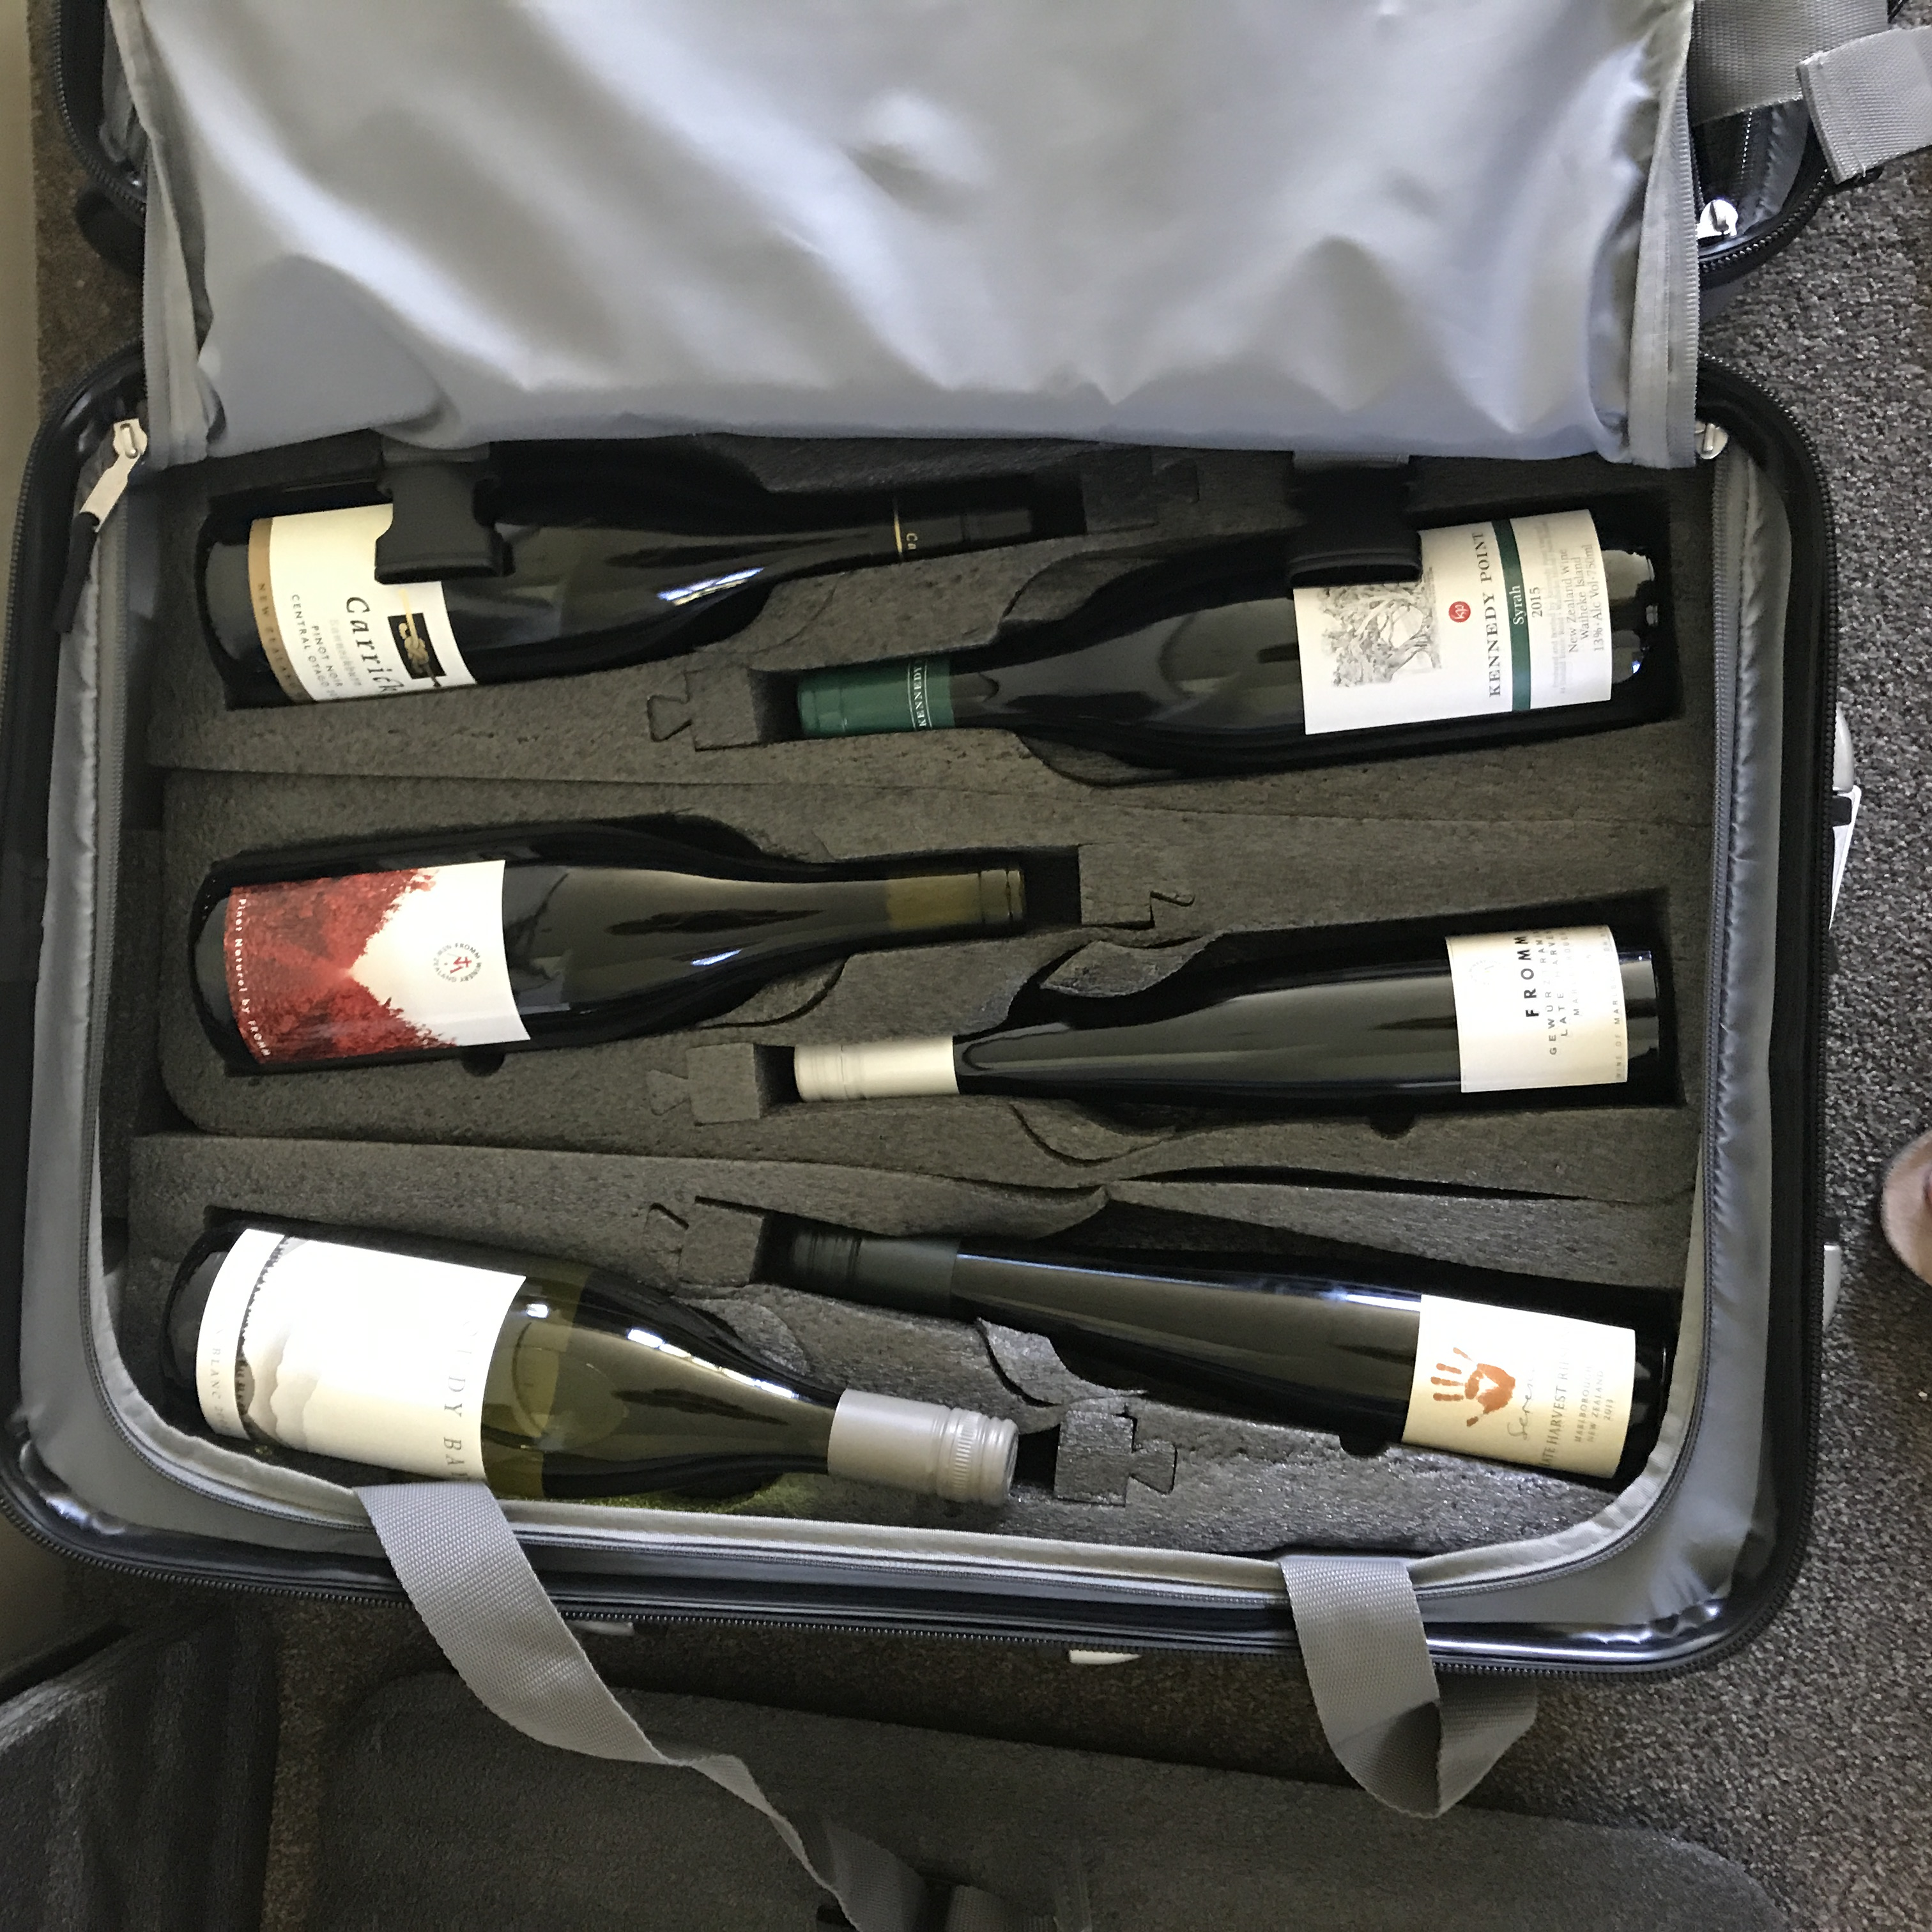 VinGardeValise Grande which holds 12 bottles wine holidays